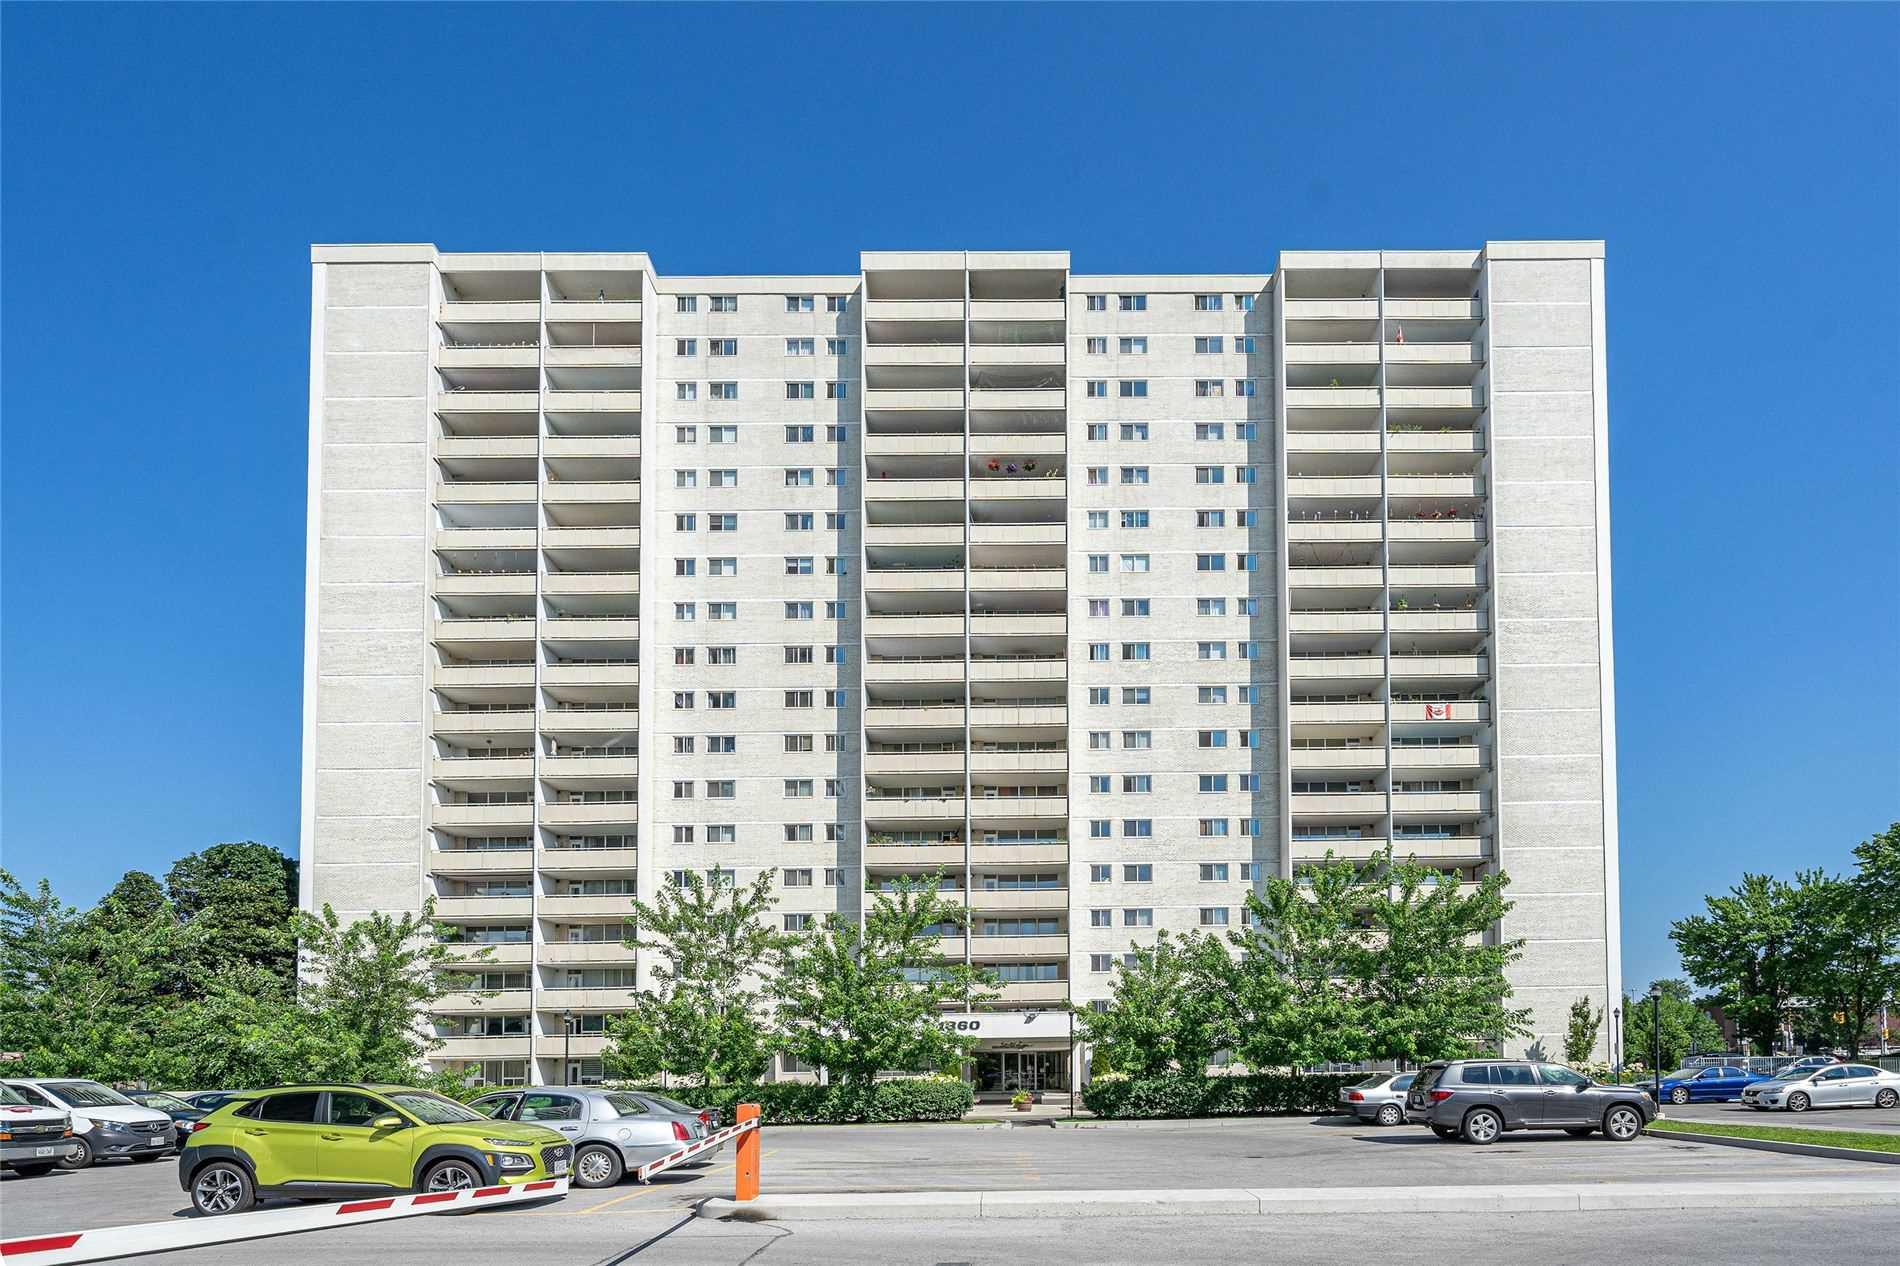 1360 York Mills Rd, Toronto, Ontario M3A2A2, 3 Bedrooms Bedrooms, 6 Rooms Rooms,2 BathroomsBathrooms,Condo Apt,For Sale,York Mills,C4886406